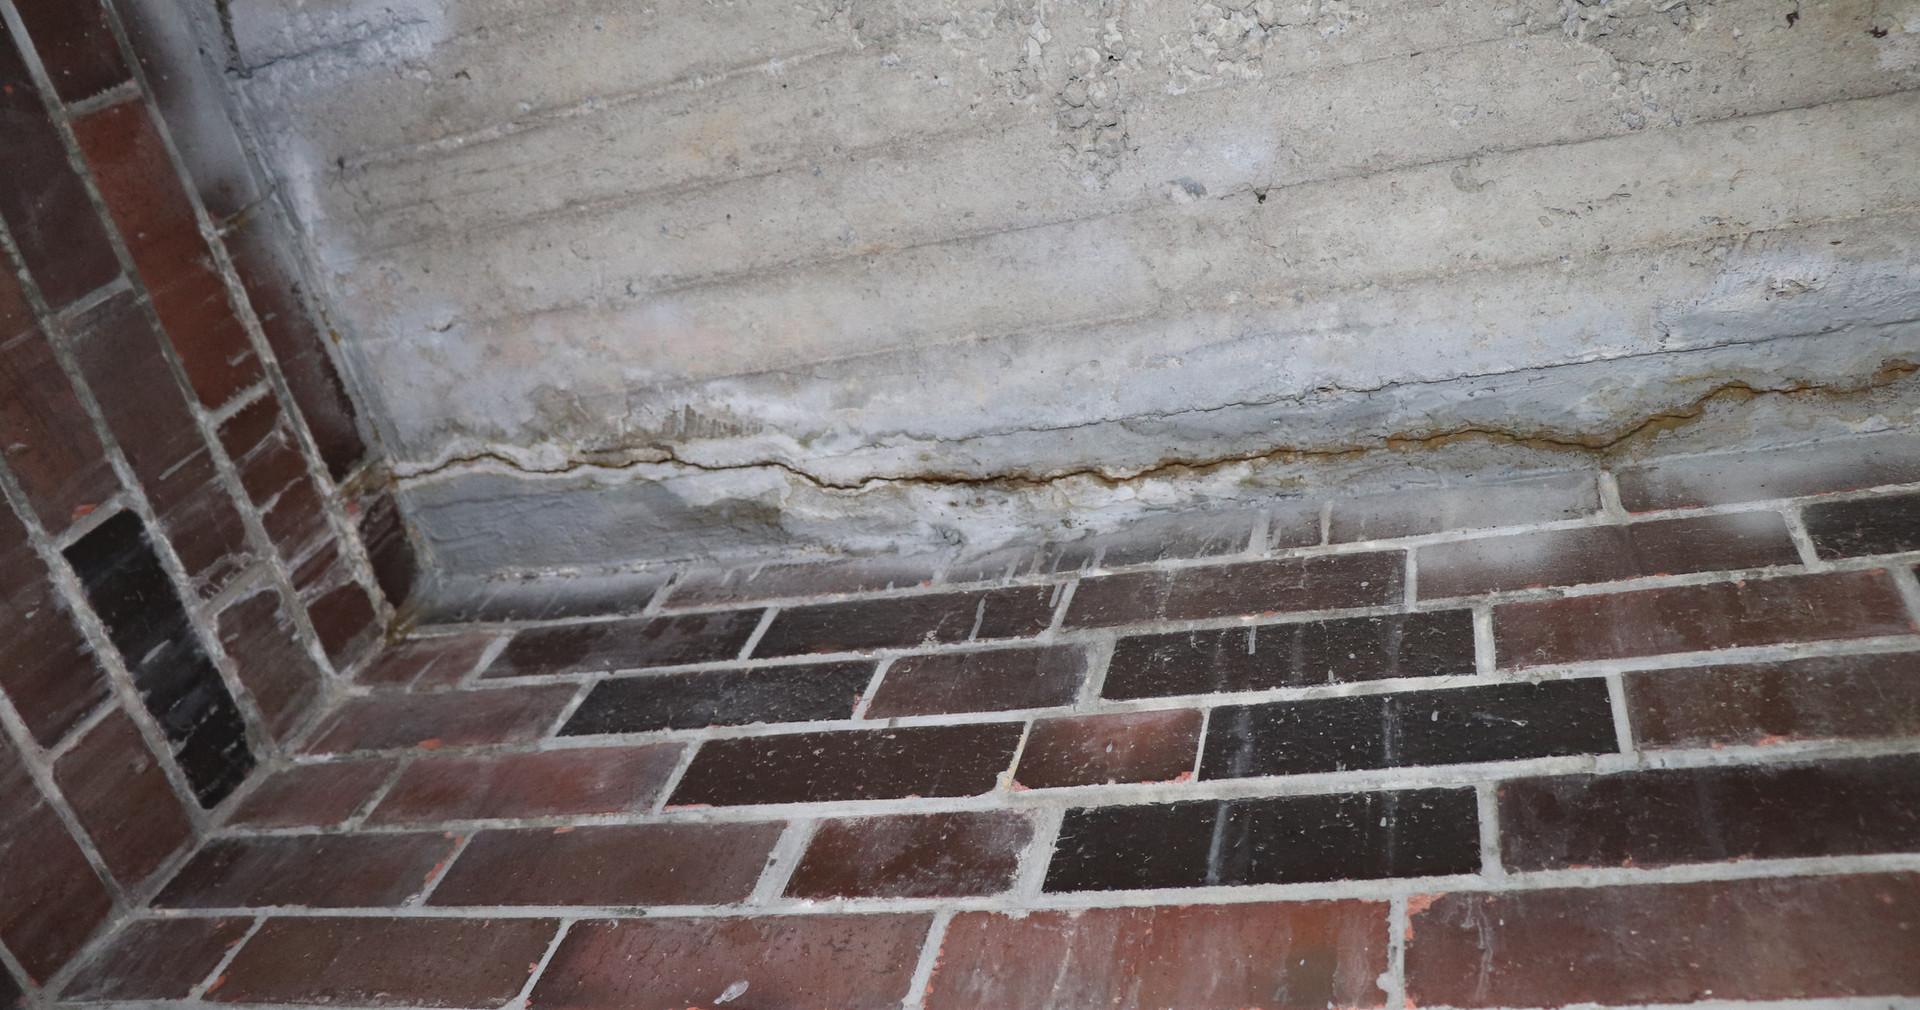 First floor longnitudinal crack, implying corrosion in reinforcement.